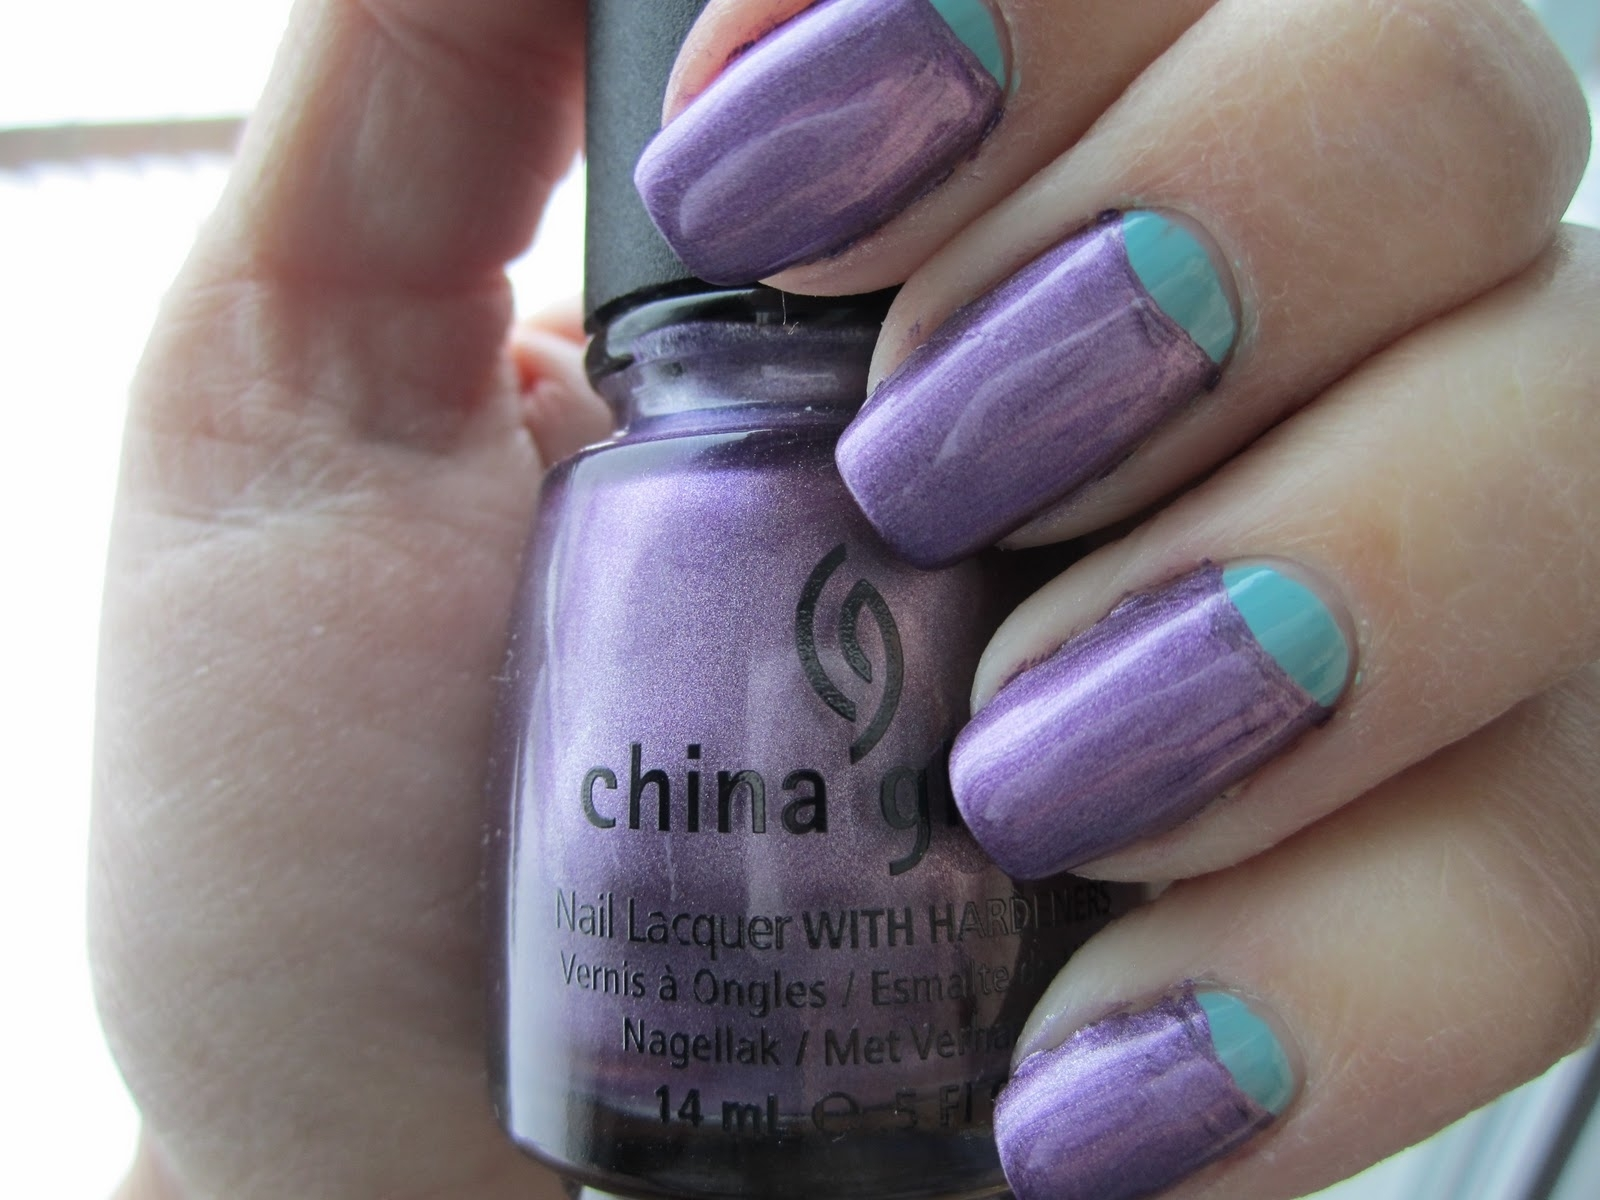 Colorsplash Nails: January 2012